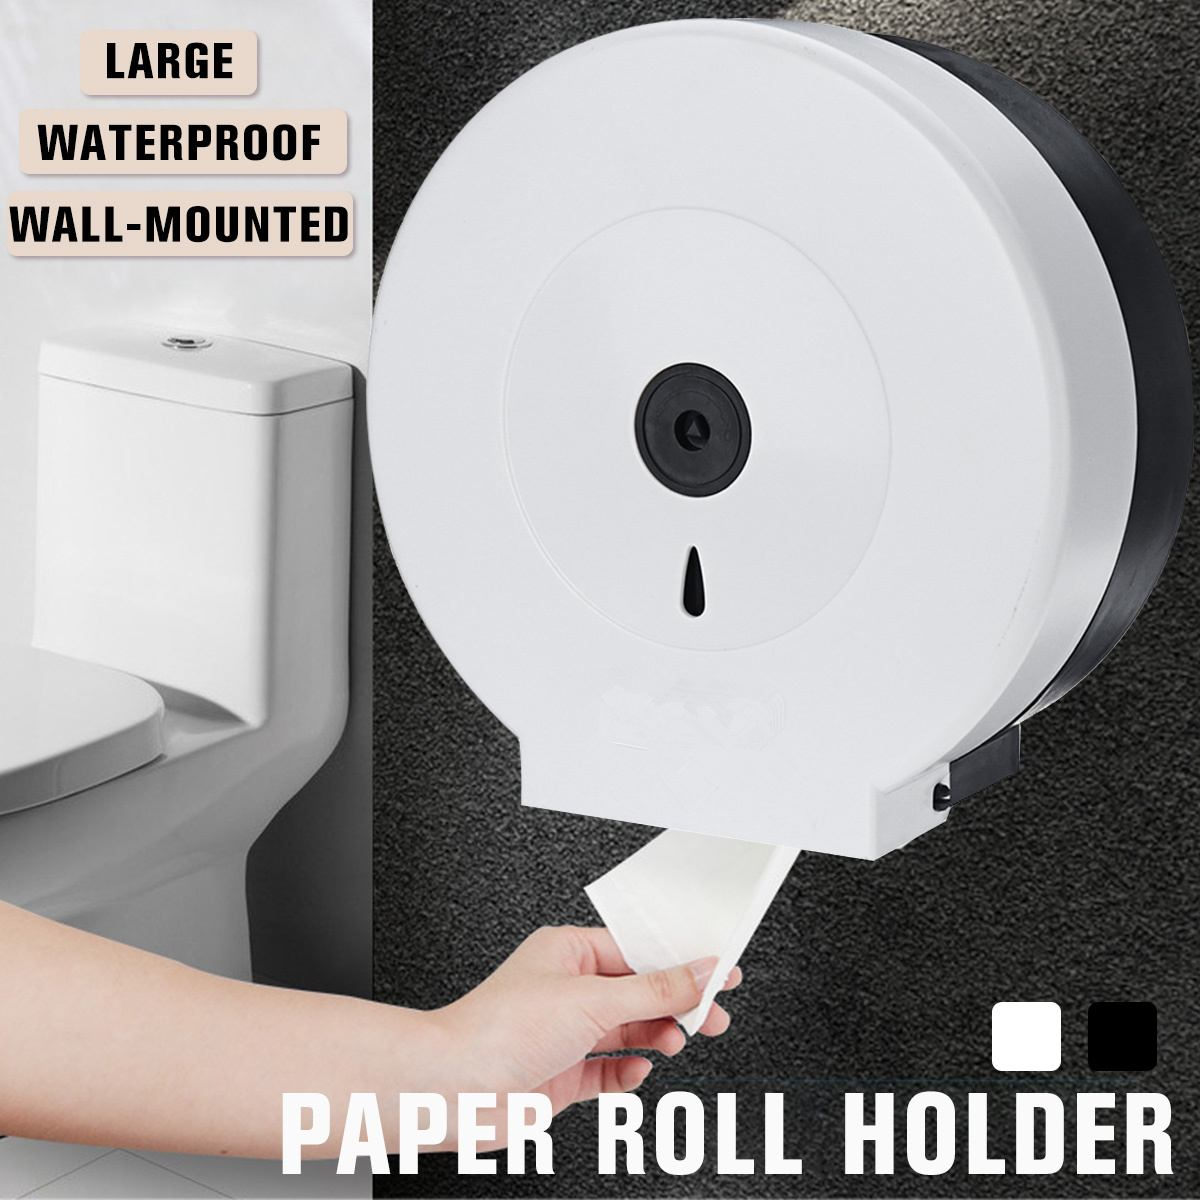 Round Roll Paper Holder Wall-mounted Bathroom Tissue Dispenser Rest Room Waterproof Toilet Paper Holder